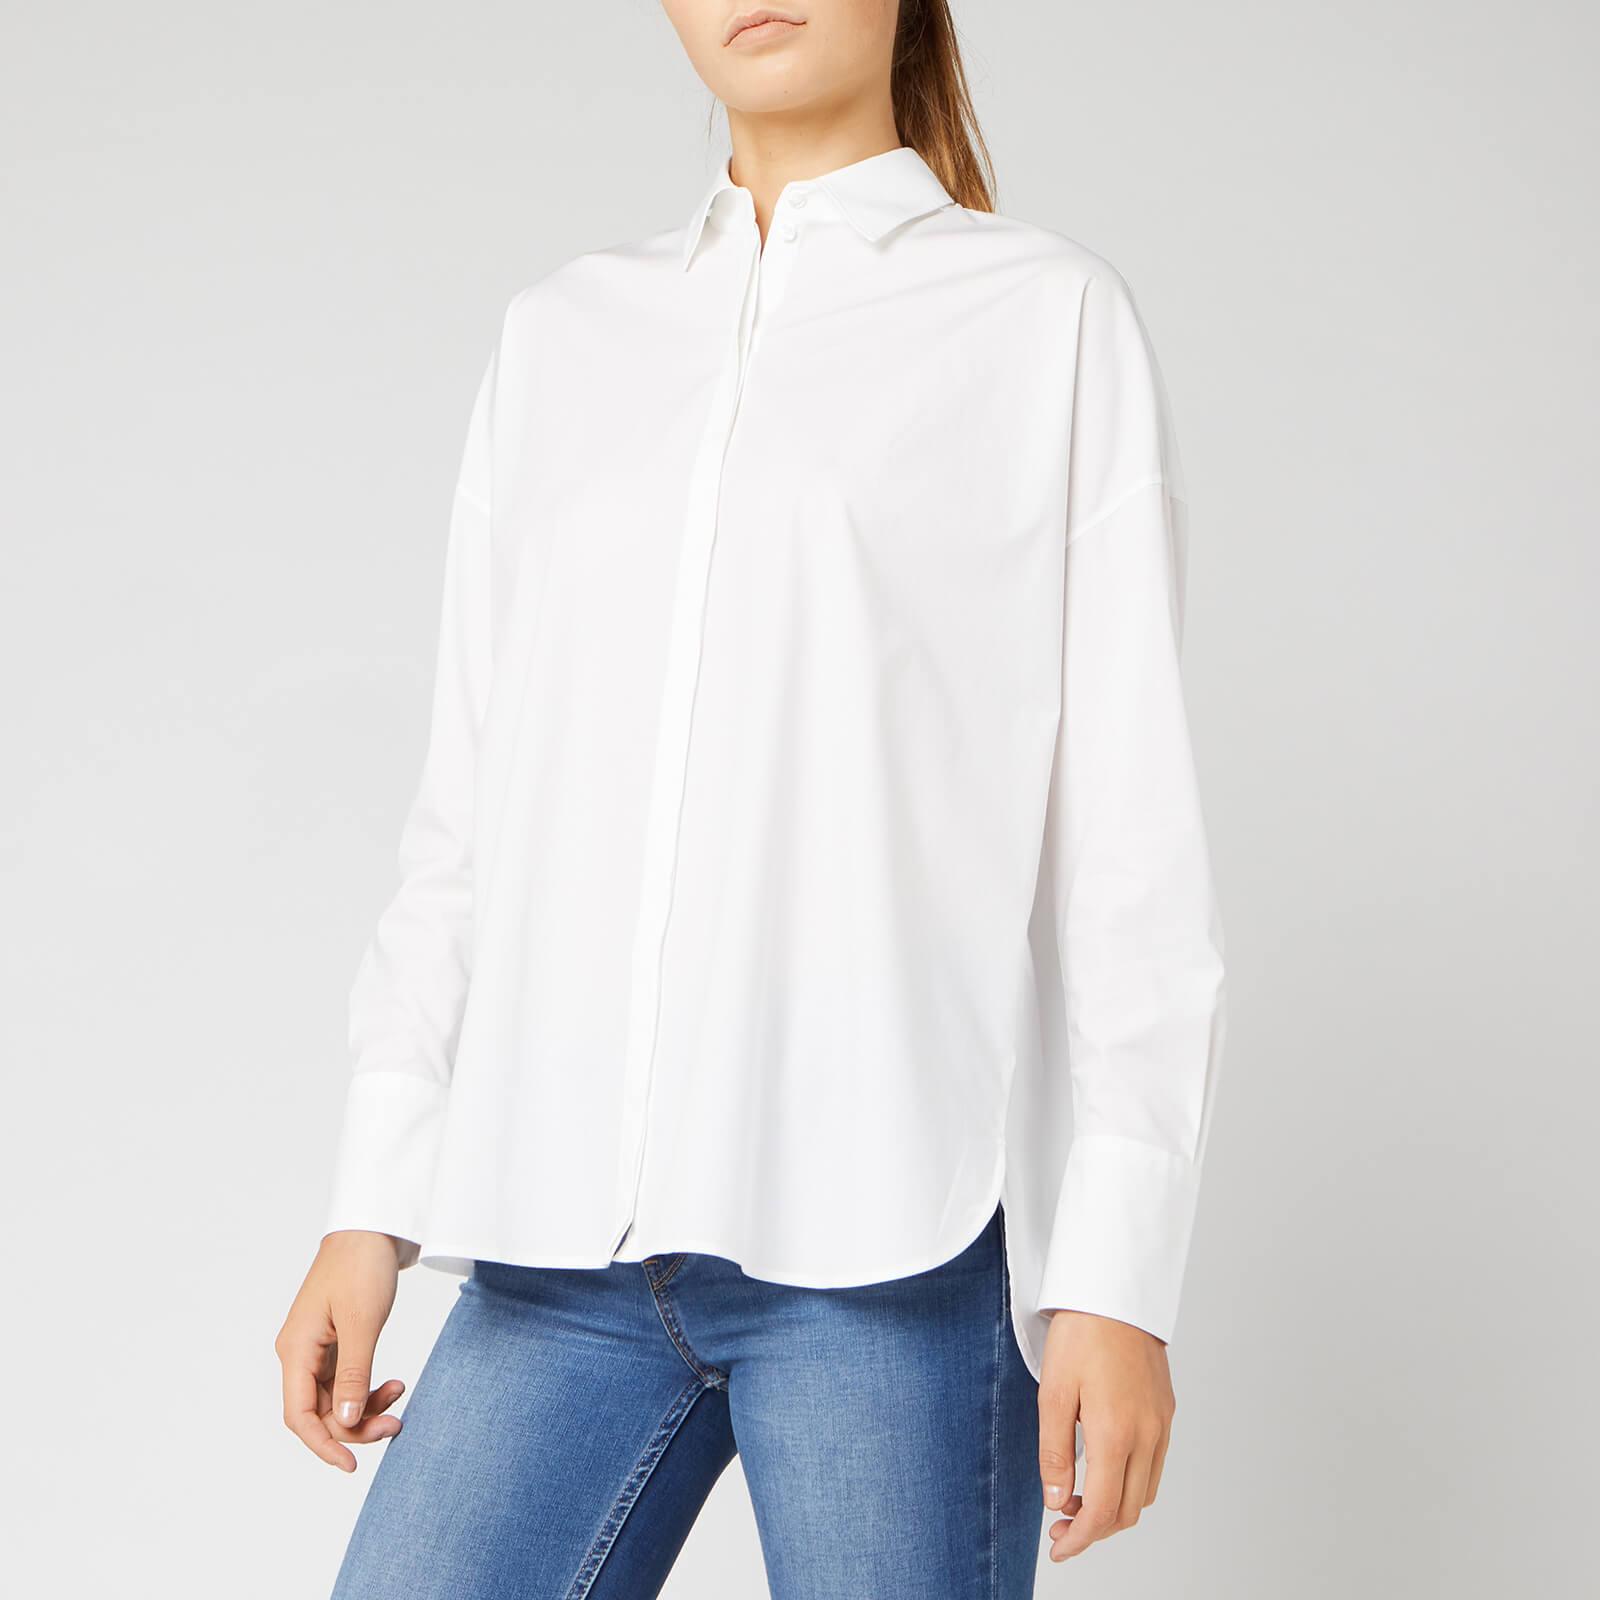 Hugo Boss Women's Elumia Shirt - White - S - White